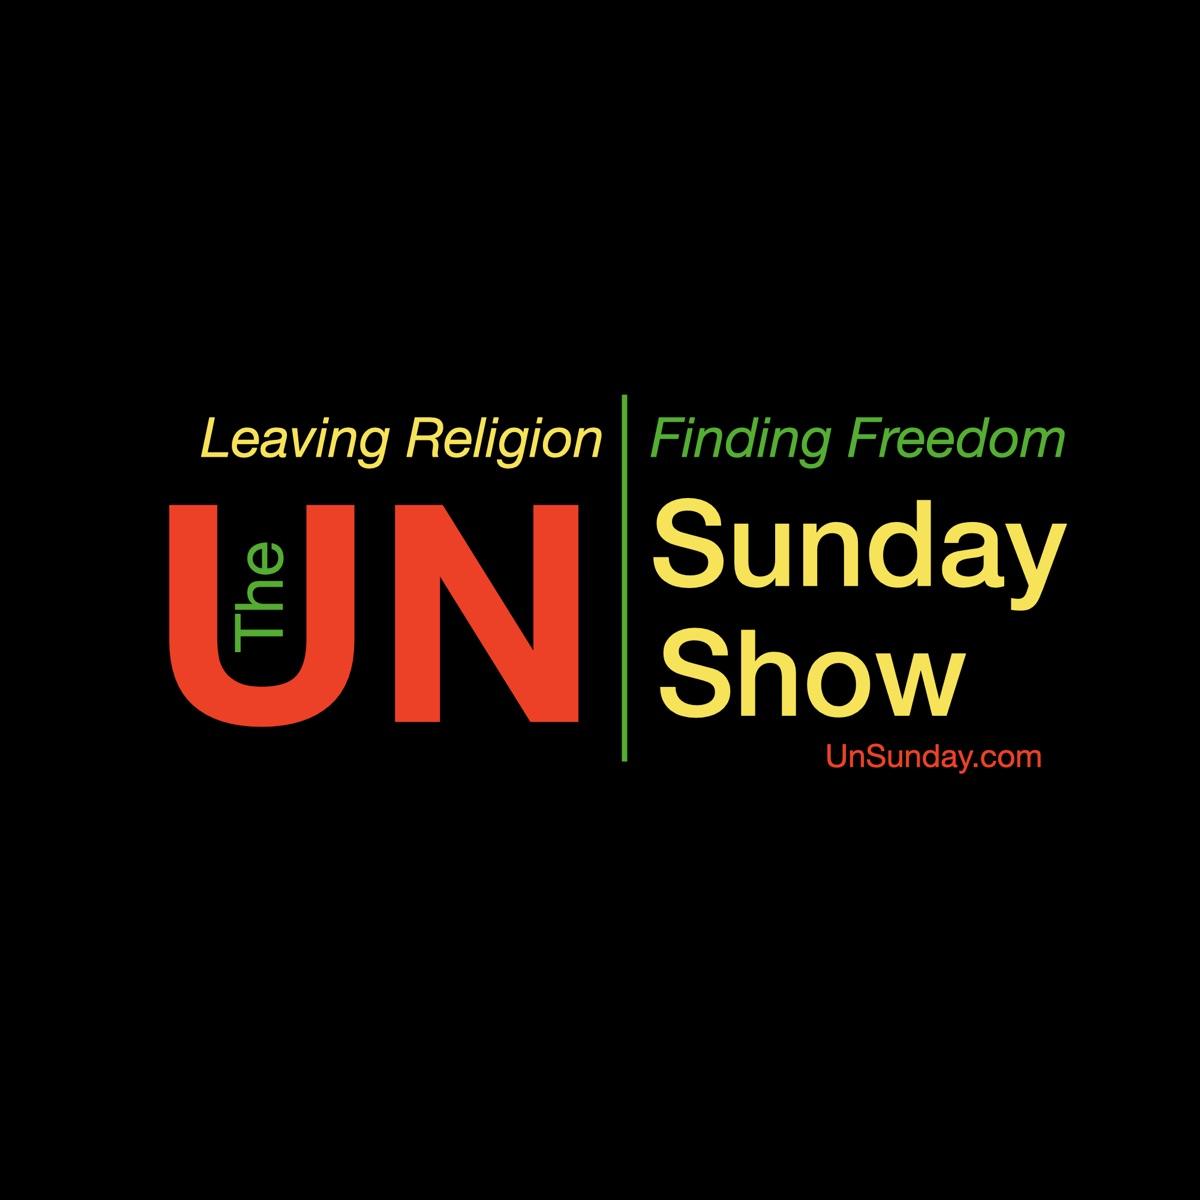 The UnSunday Show